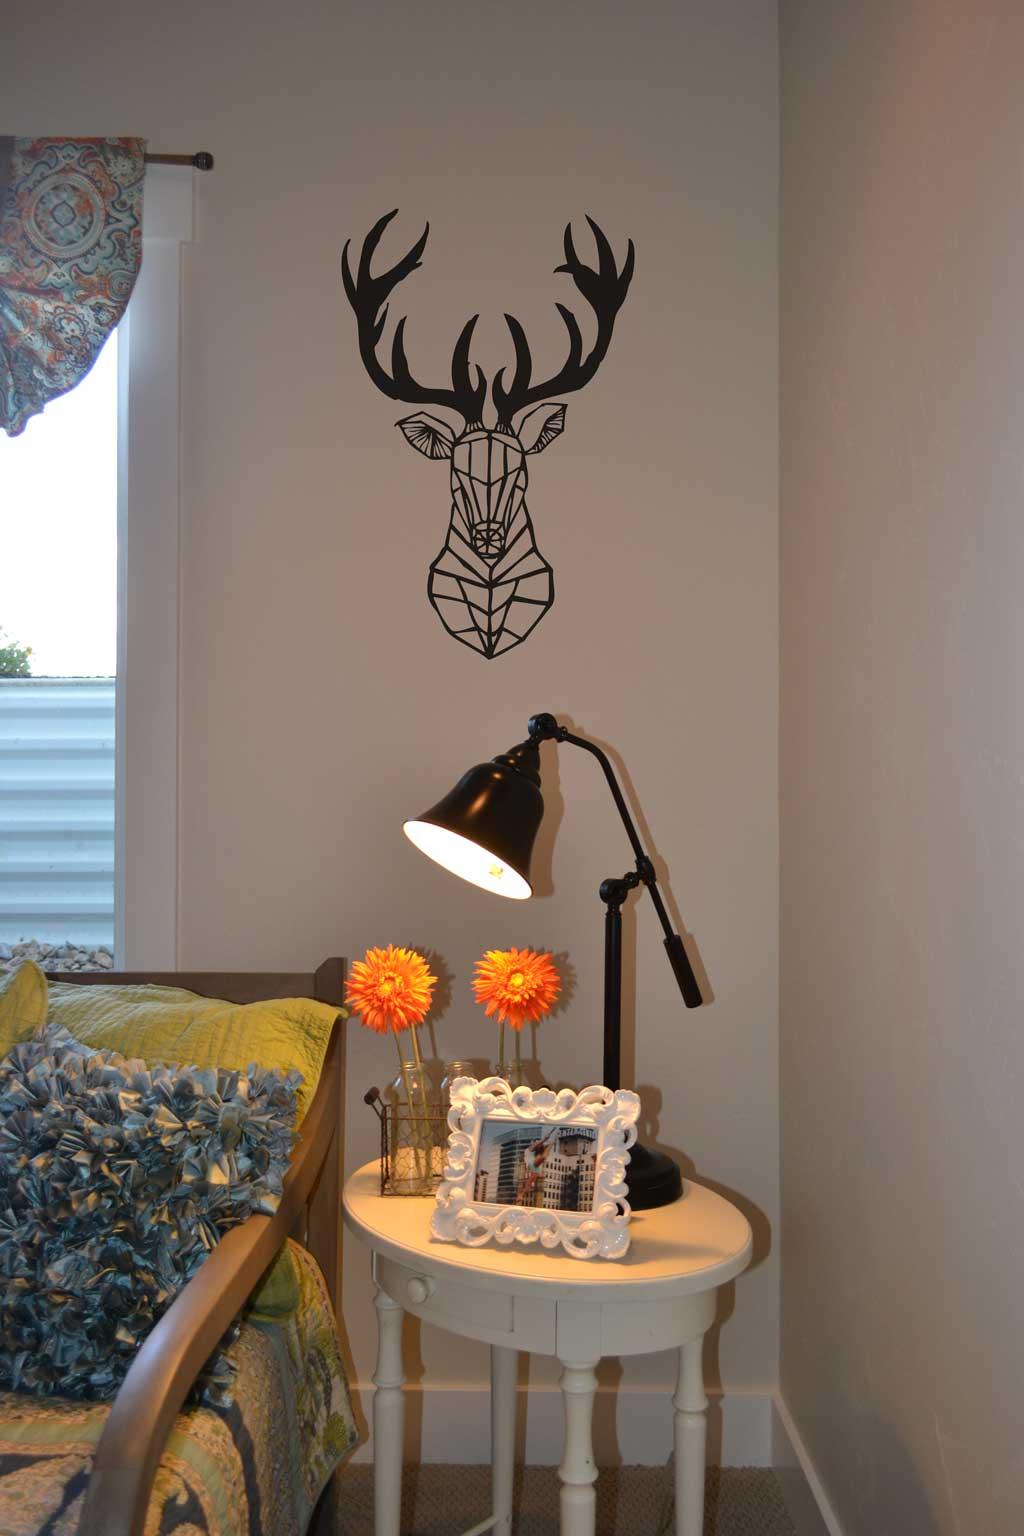 Hakuna Matata Wall Stickers Vinyl 4 Decor Deer Head Geometric Shape